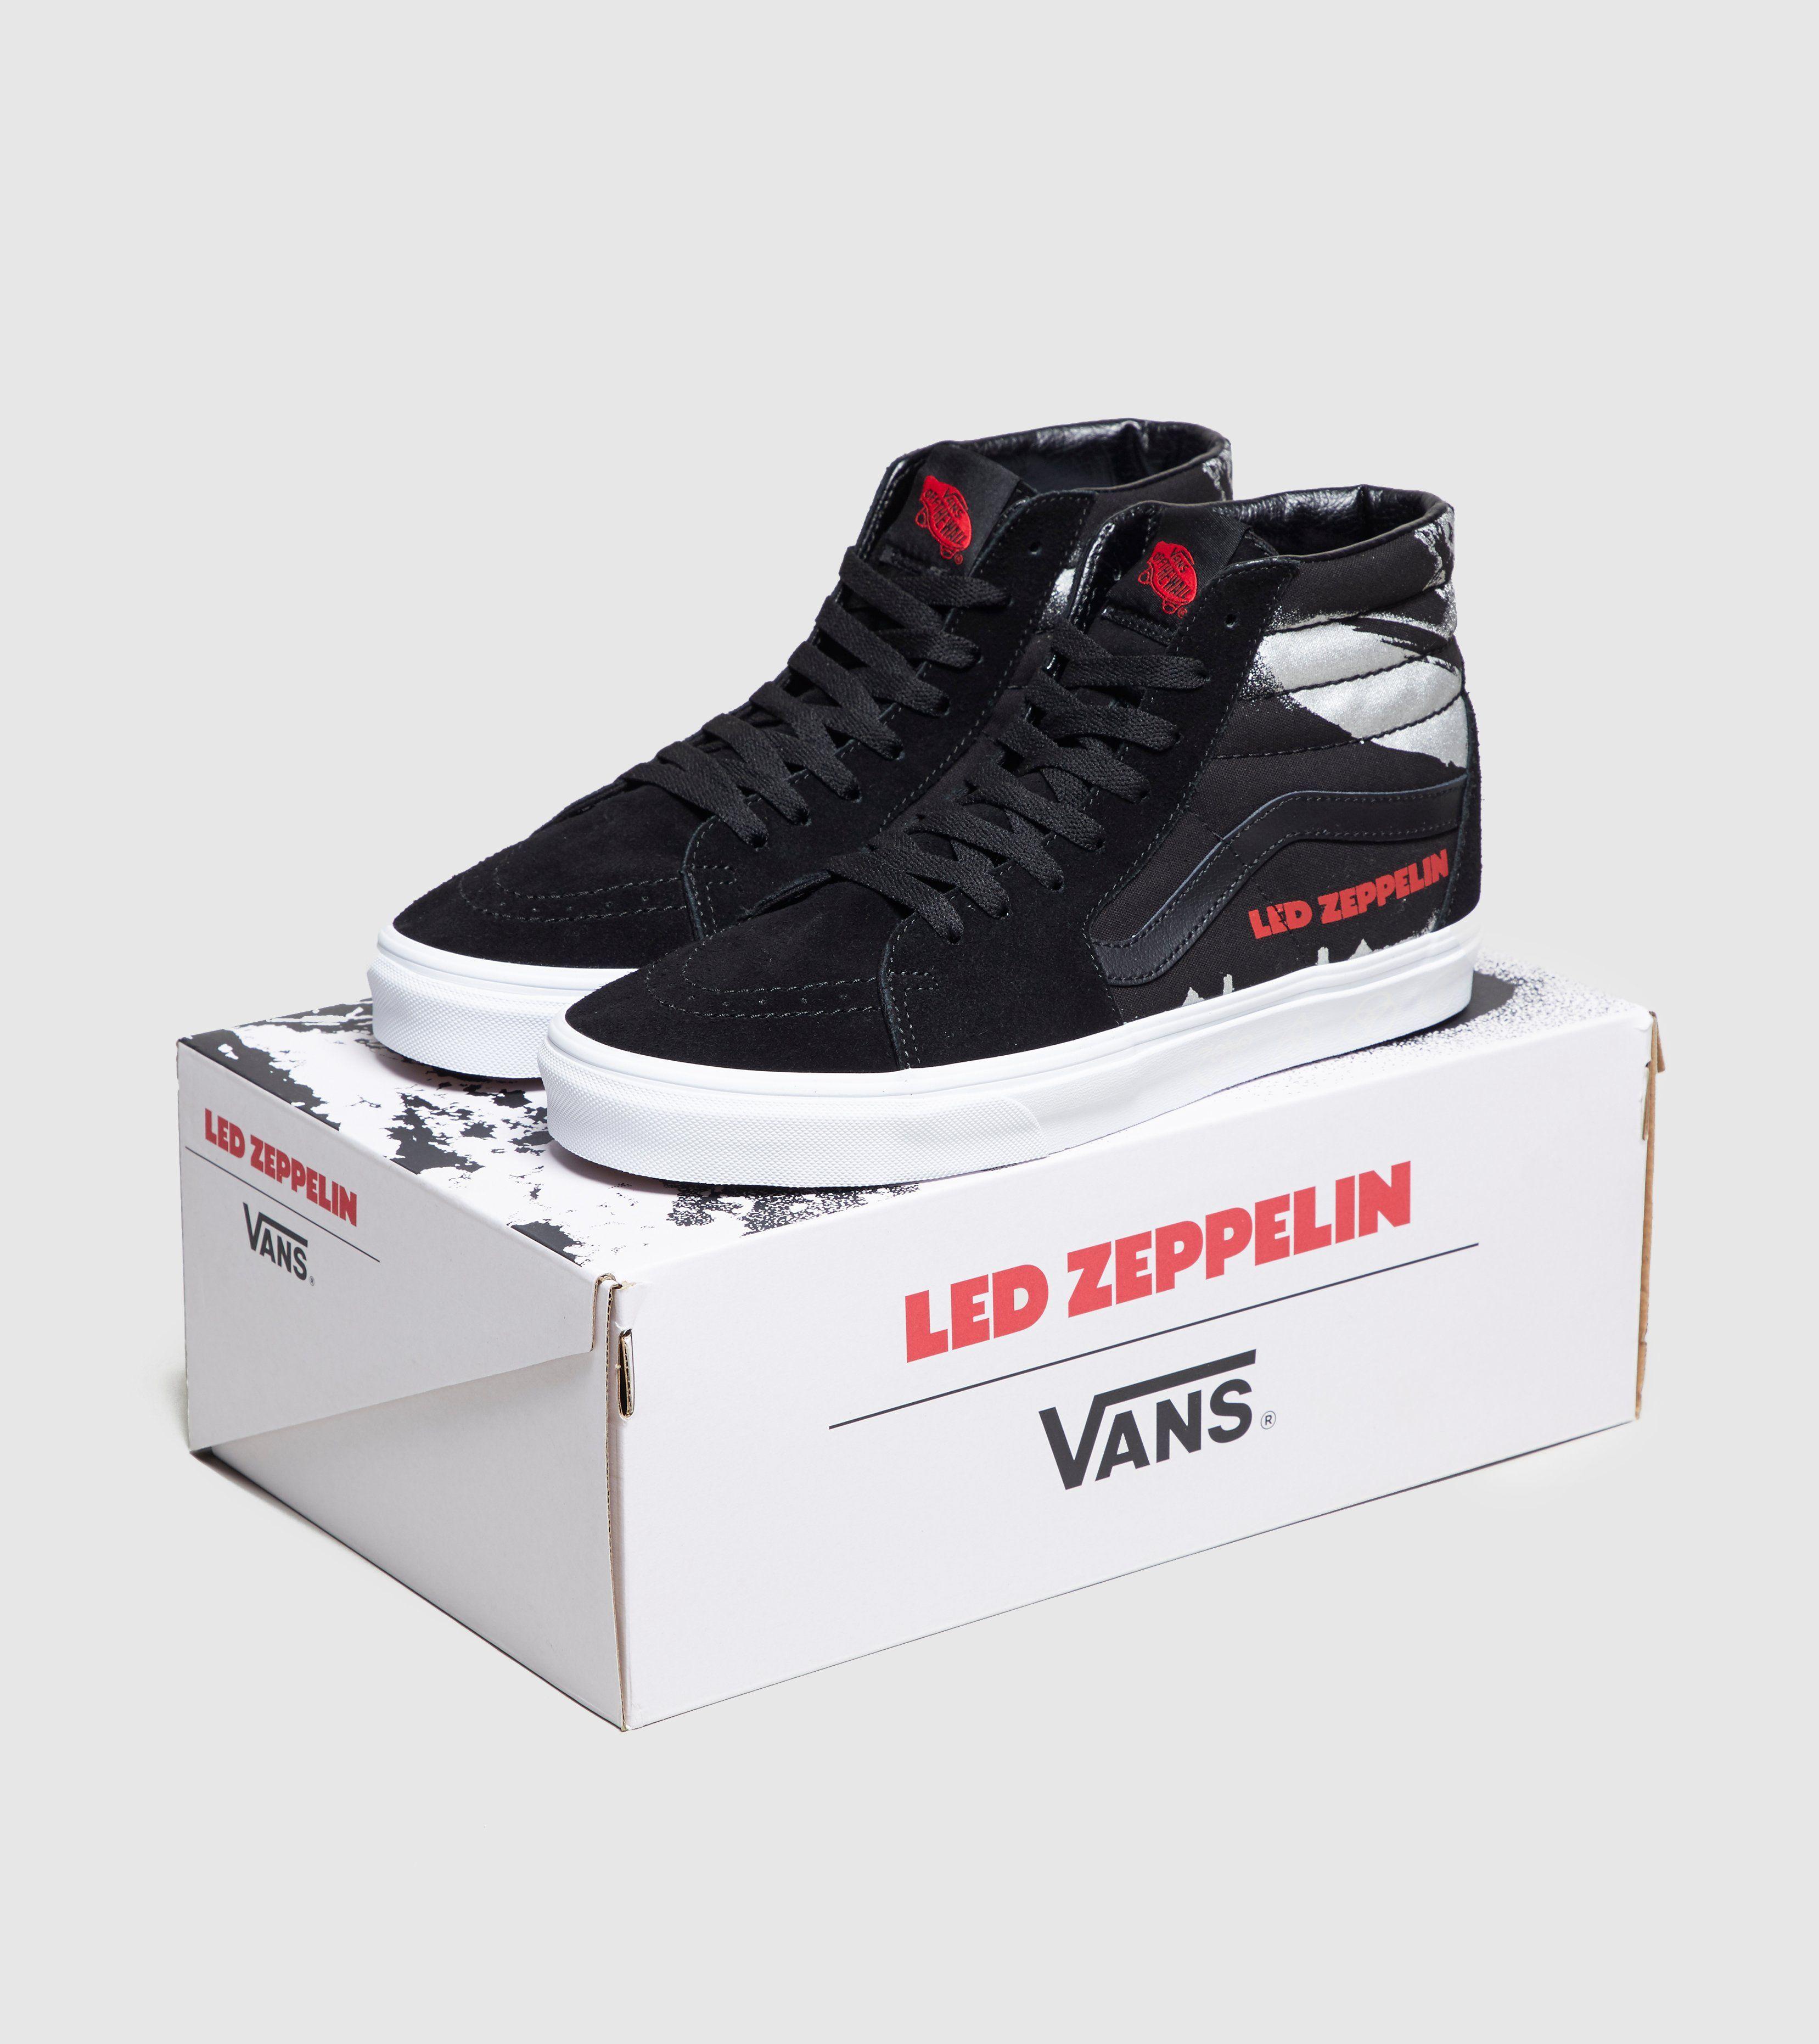 Vans x Led Zeppelin Sk8-Hi